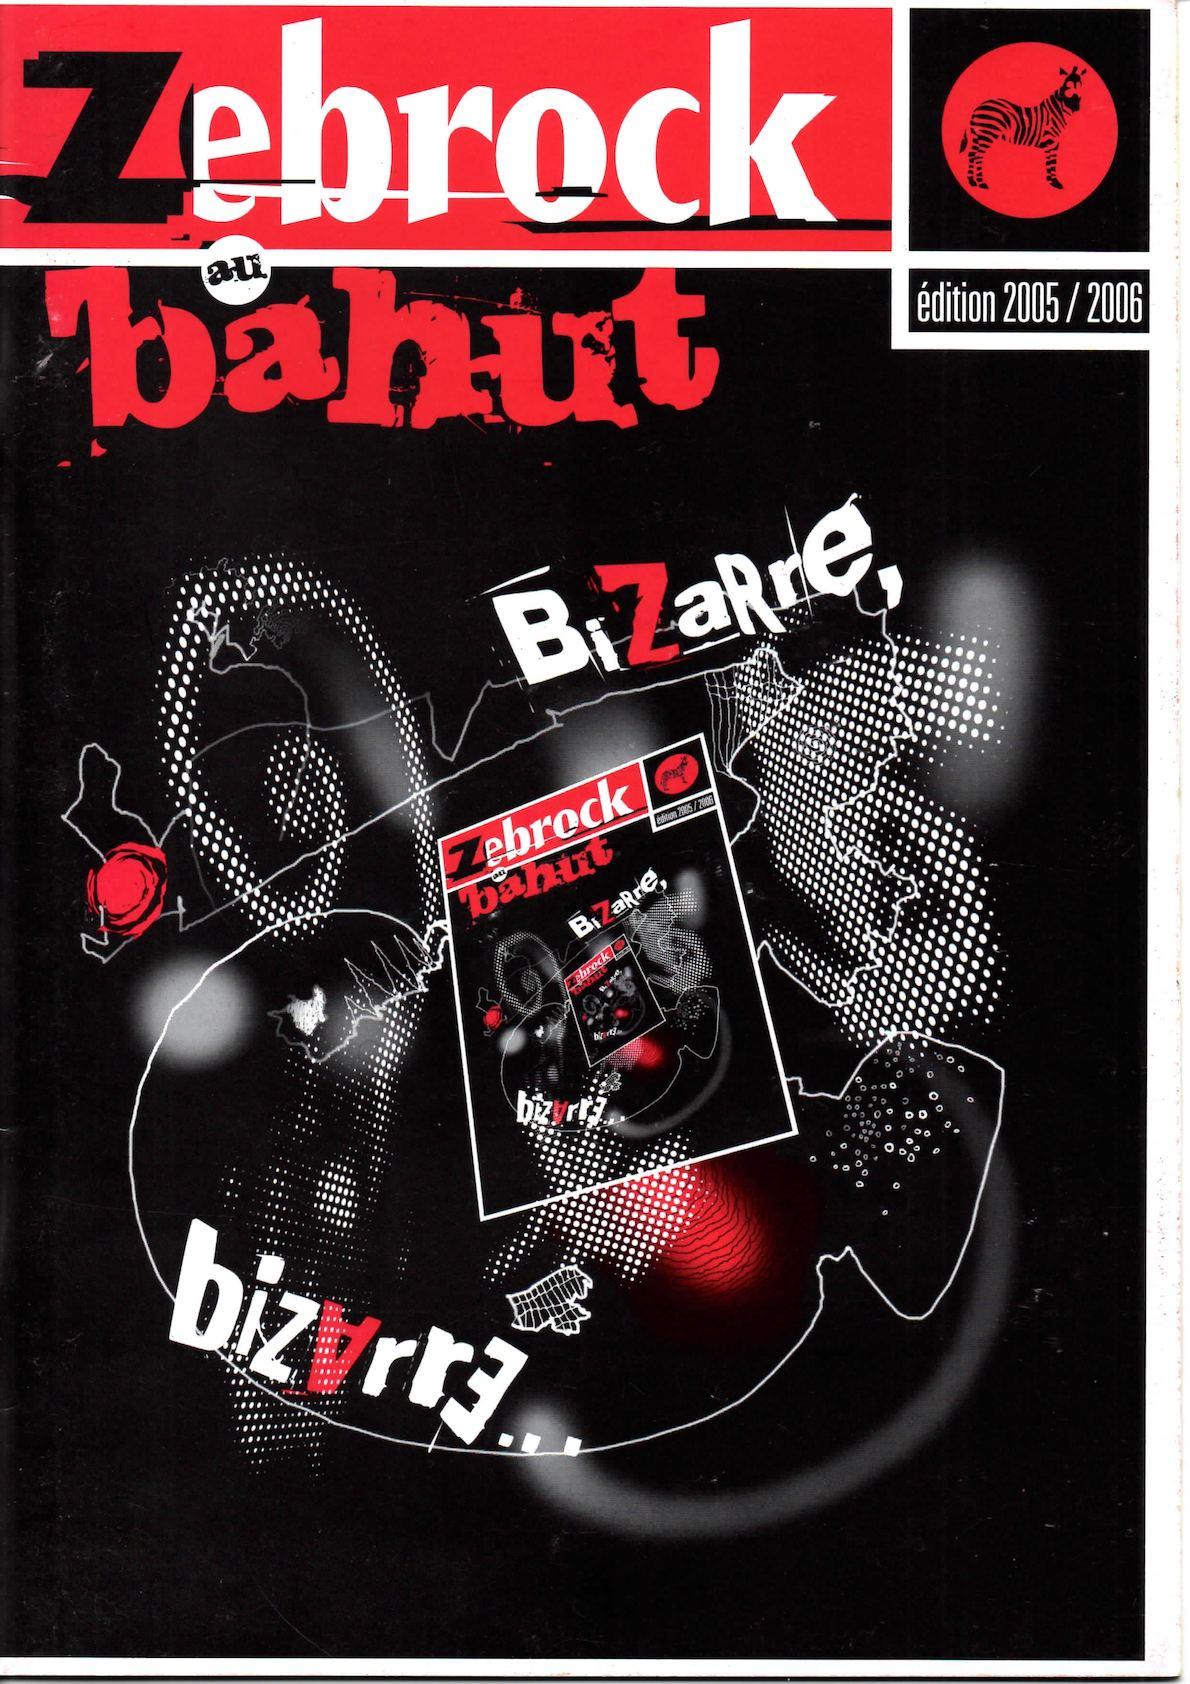 Bizarre Livret 2006 Zebrock Bahut Calaméo 2005 Au n0OymvN8w